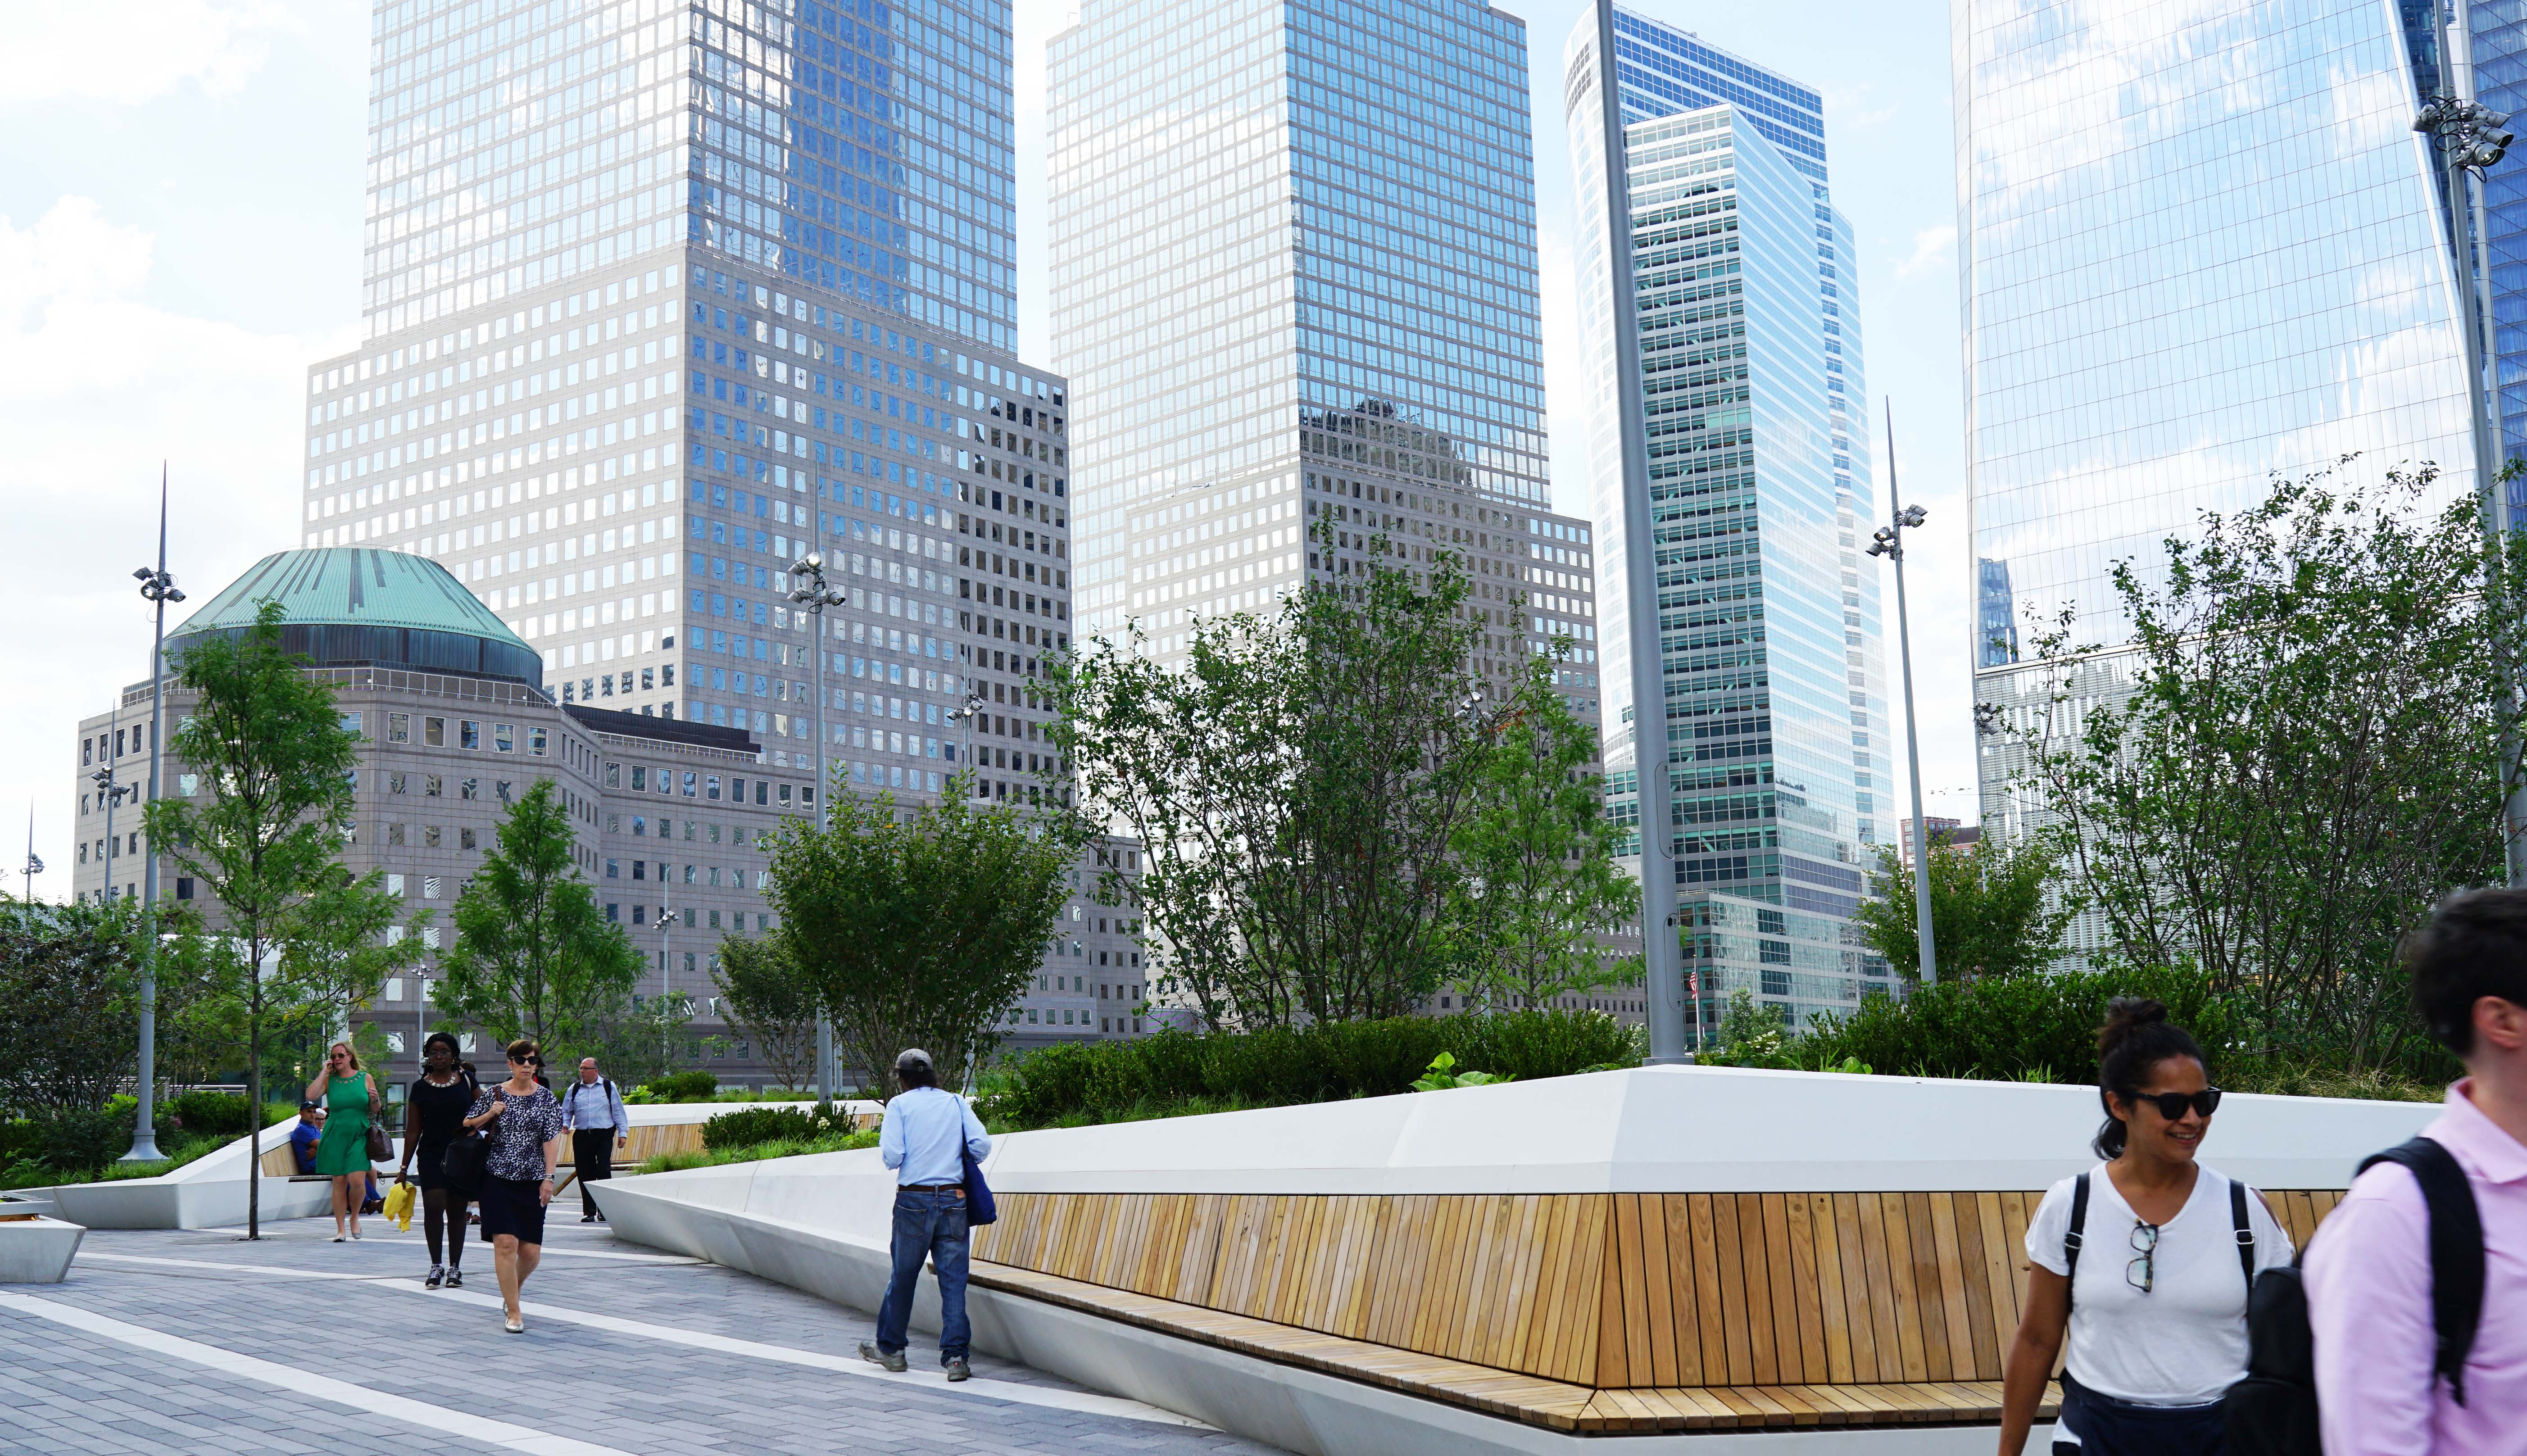 Liberty park benches